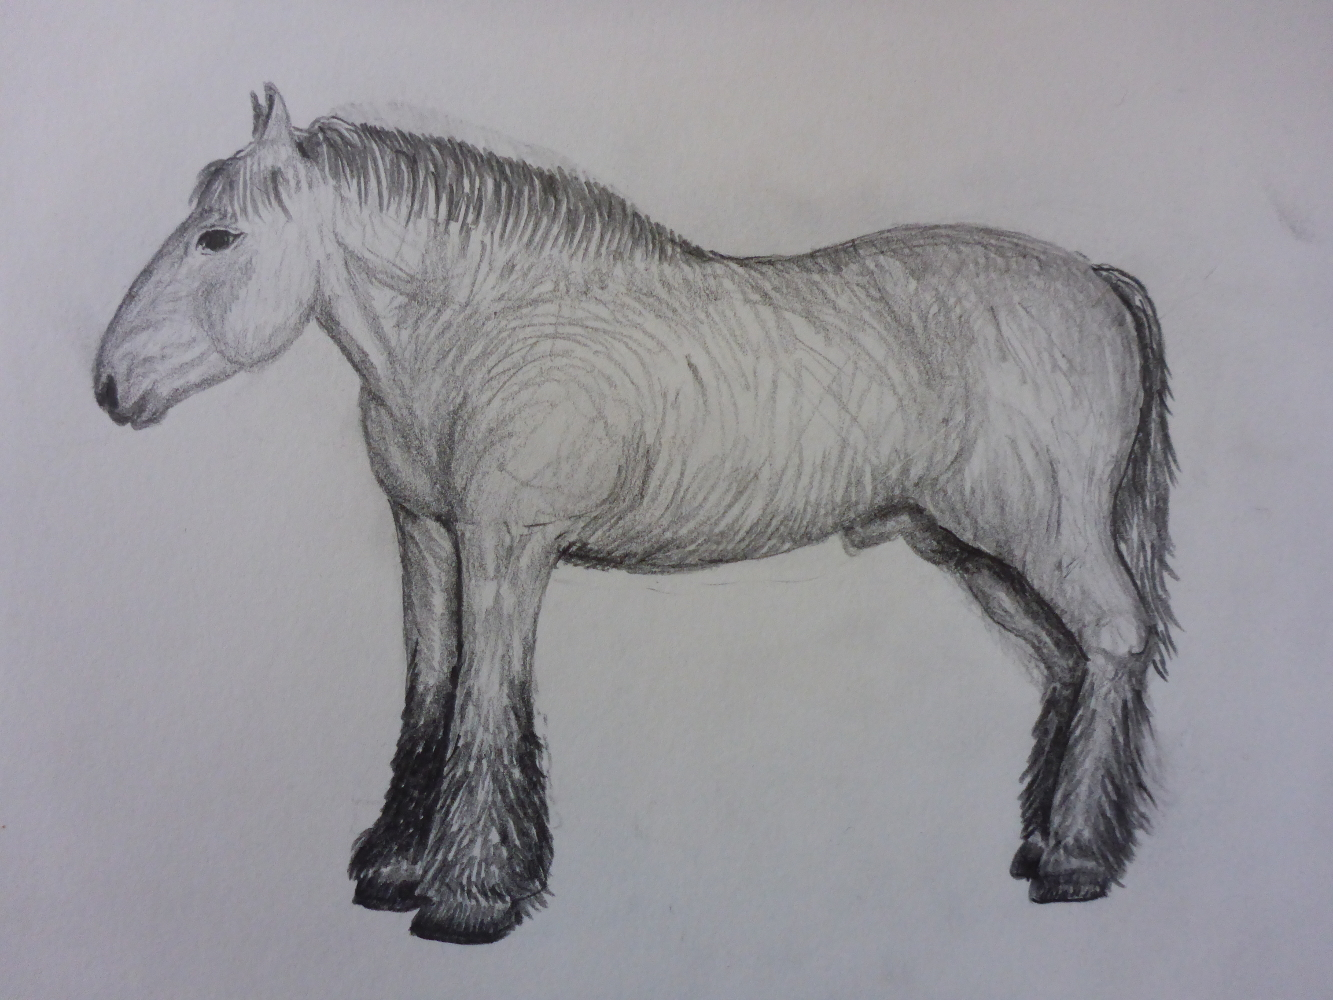 """Stallion I"", 2018, pencil on paper, 30 x 21 cm"